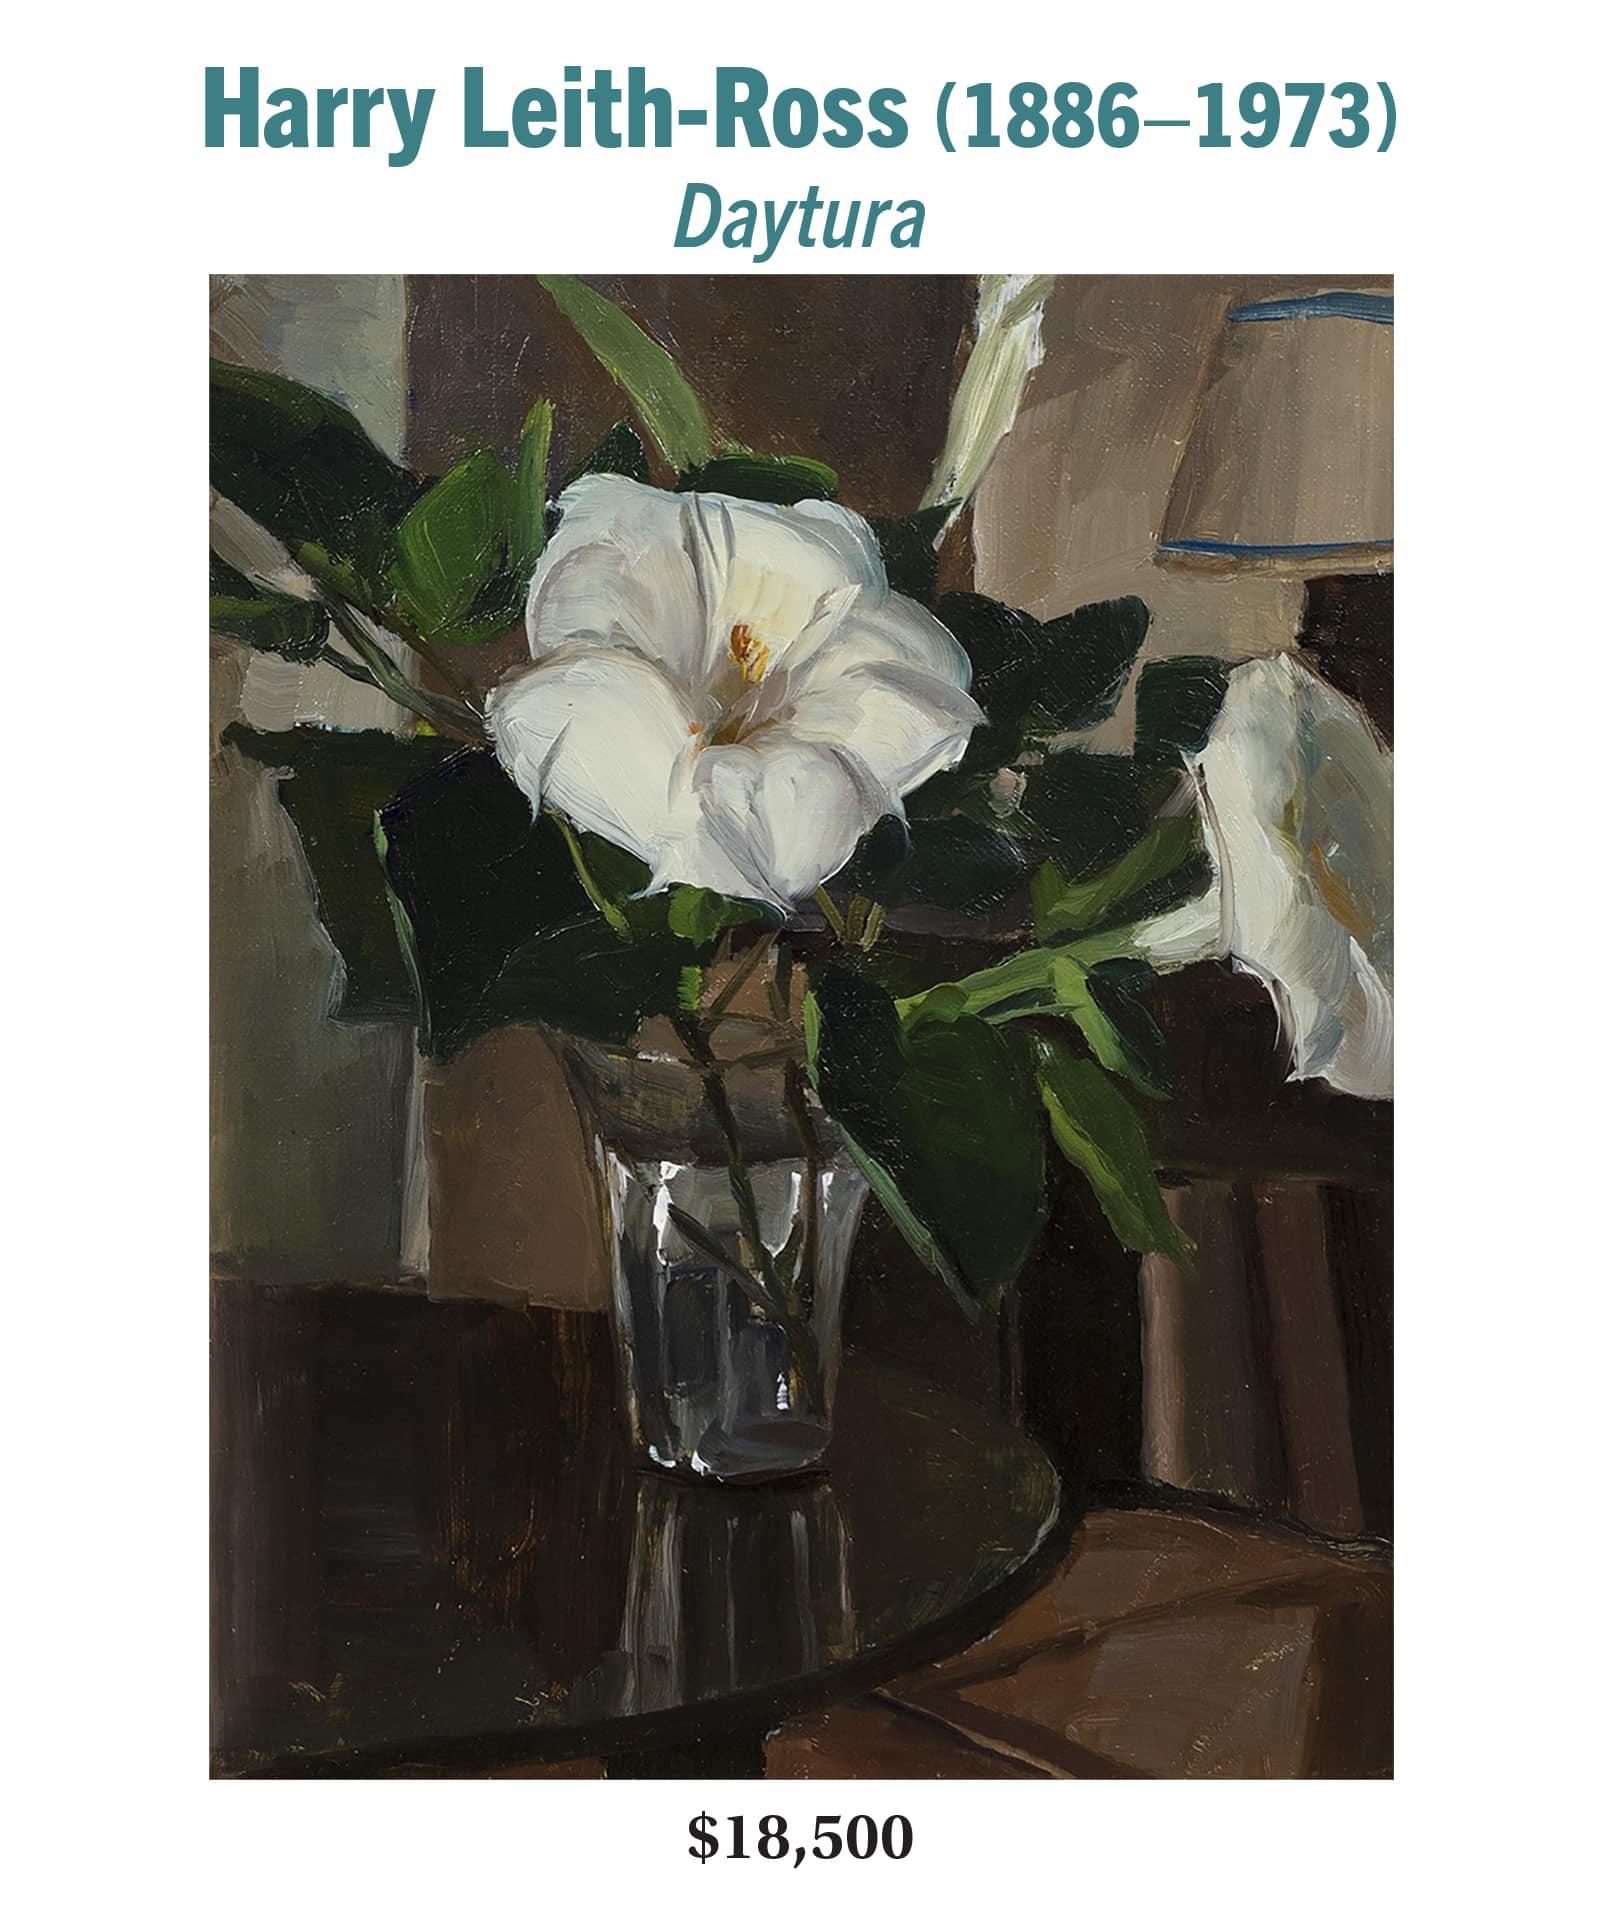 Harry Leith-Ross (1886–1973), Daytura, oil on board, American still-life painting